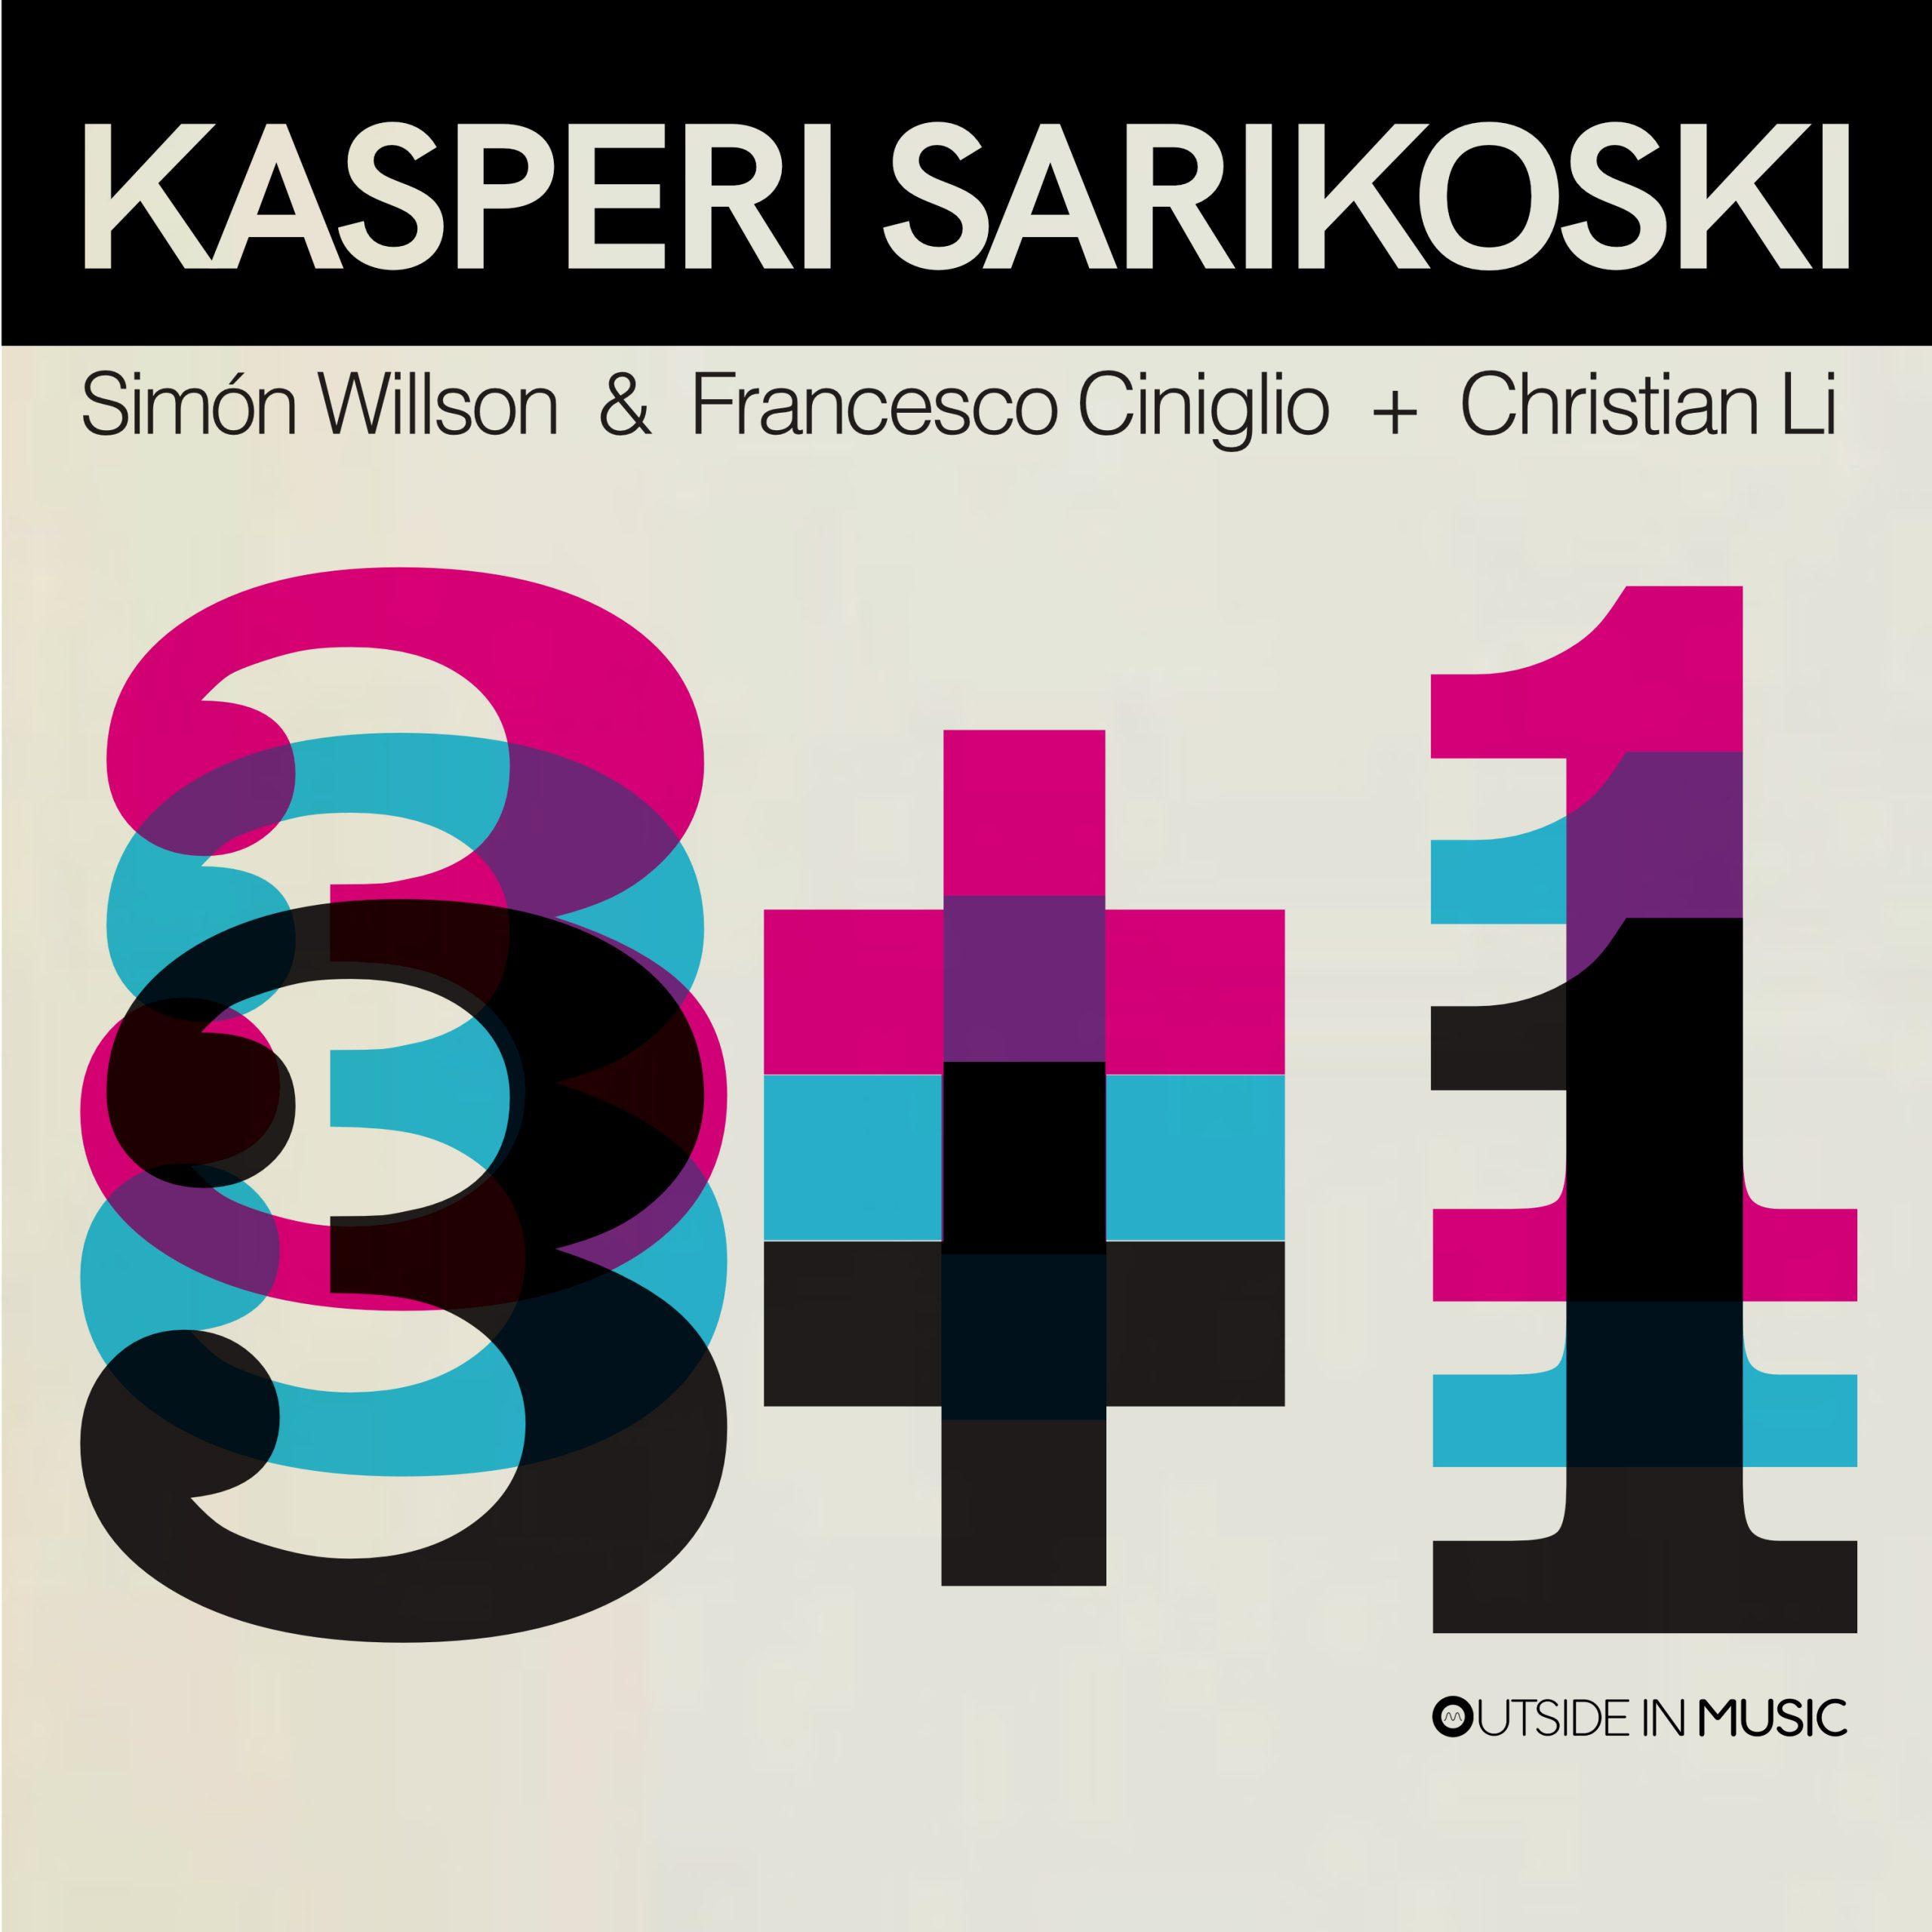 NEW RELEASE: Kasperi Sarikoski's 3 + 1 is out October 23, 2020 via Outside in Music